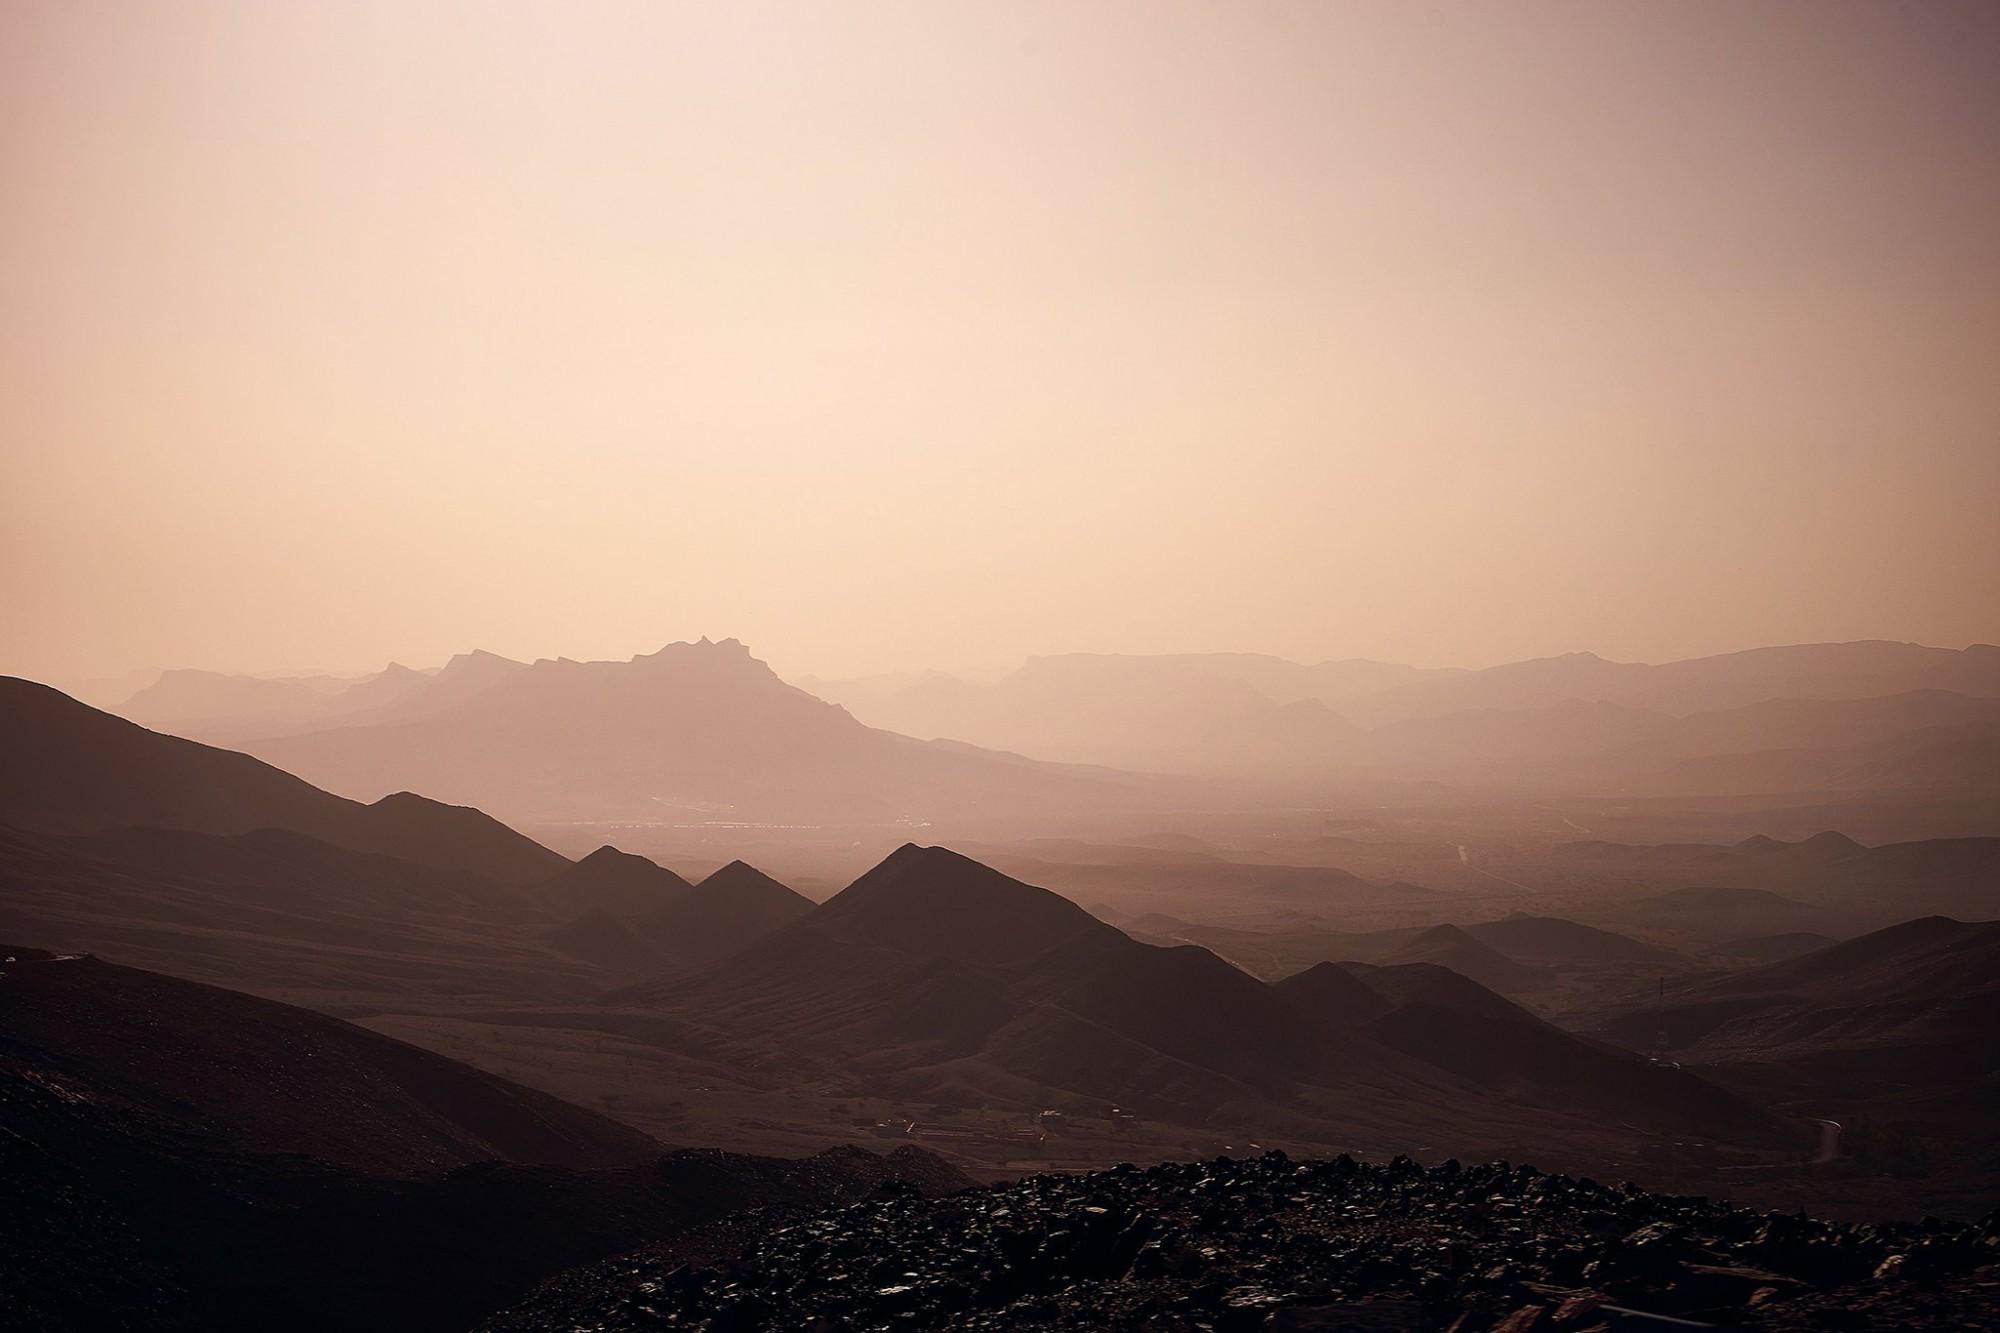 Afbeelding: Dominique Van Huffel, reisreportage, Marokko, Tizi n Tichka.